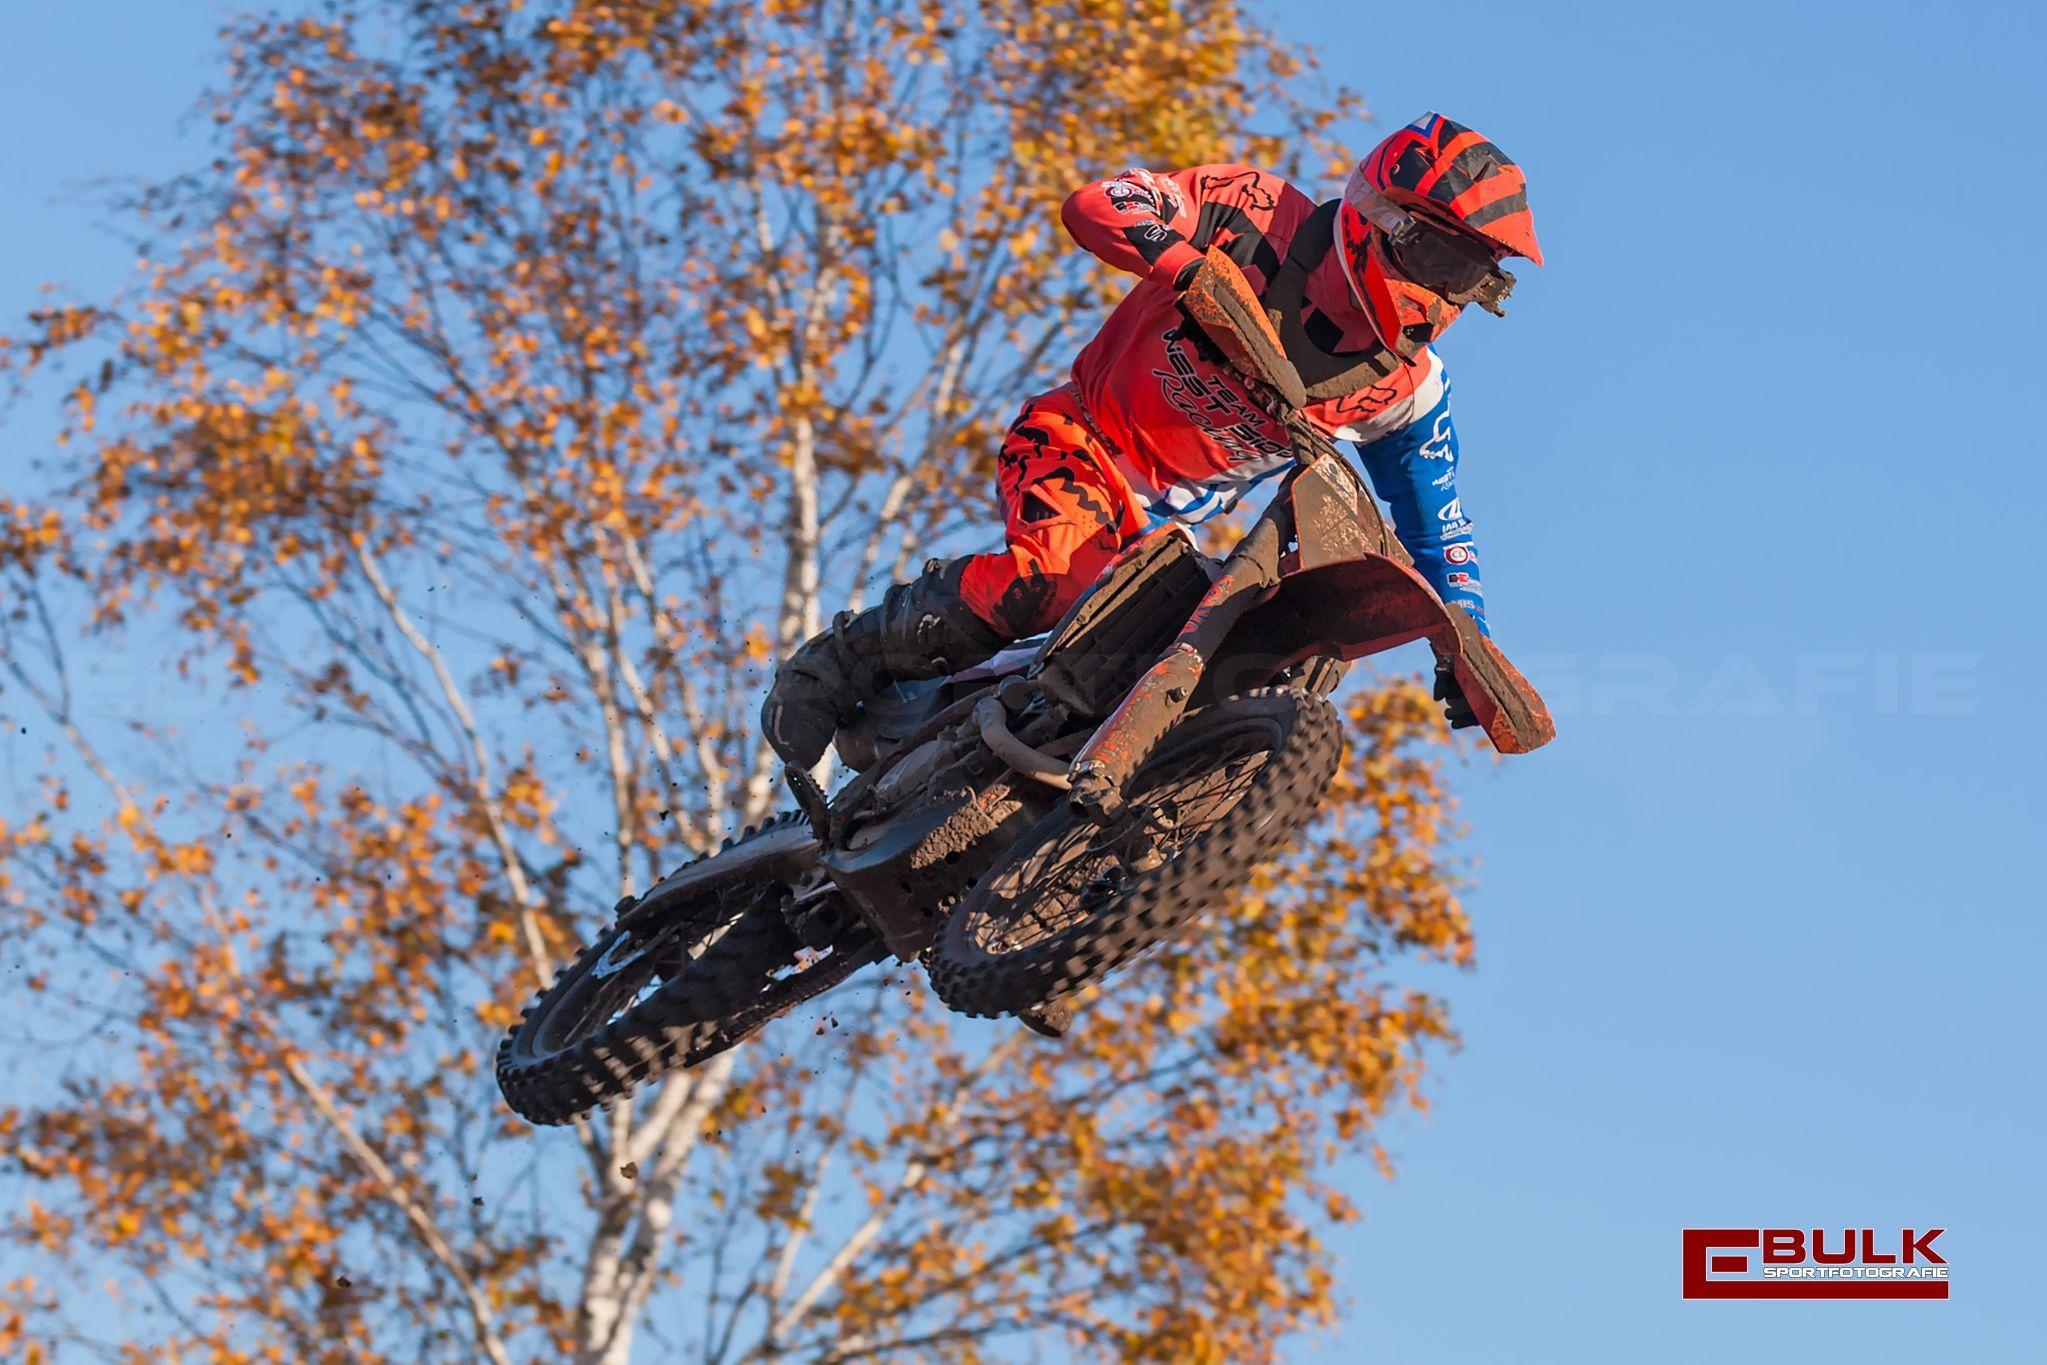 ebs_0507-ed_bulk_sportfotografie